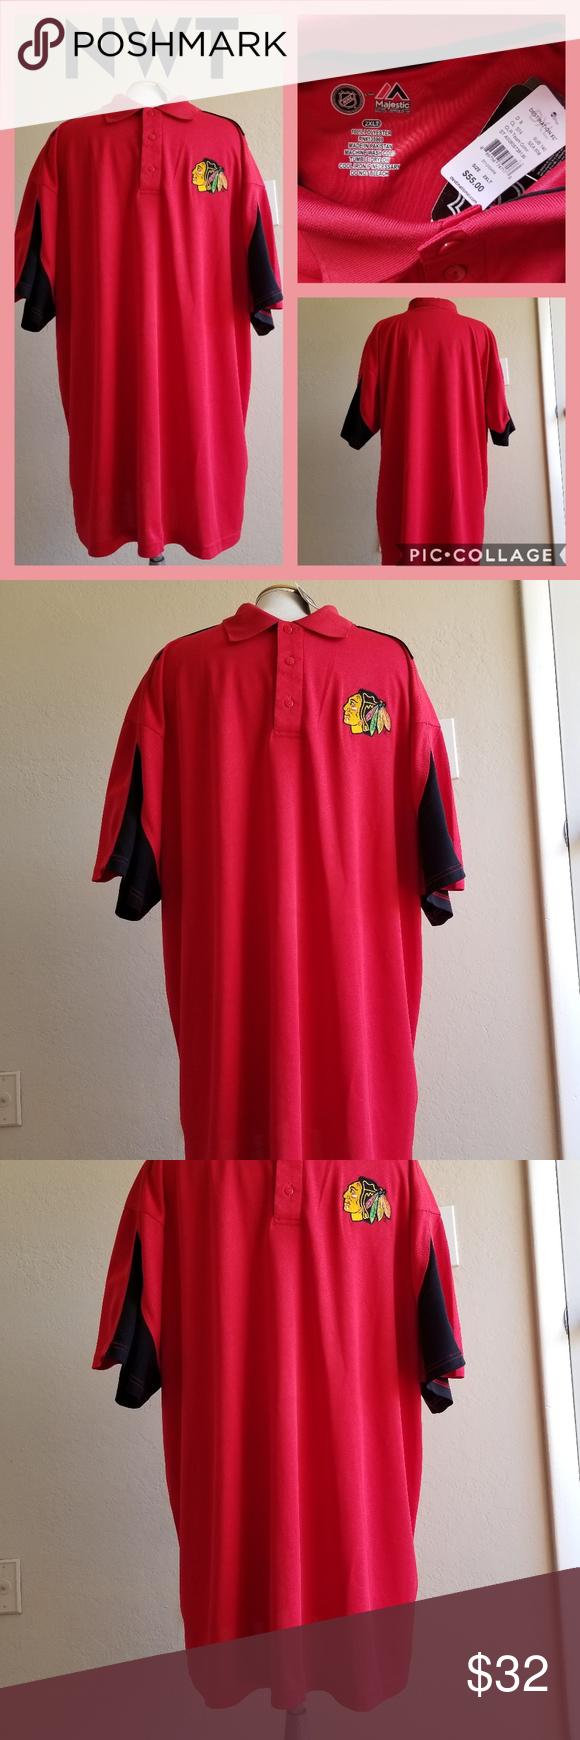 9d31079bf 2XL NHL Chicago Blackhawks logo shirt Big & Tall New with tags! Tag  price